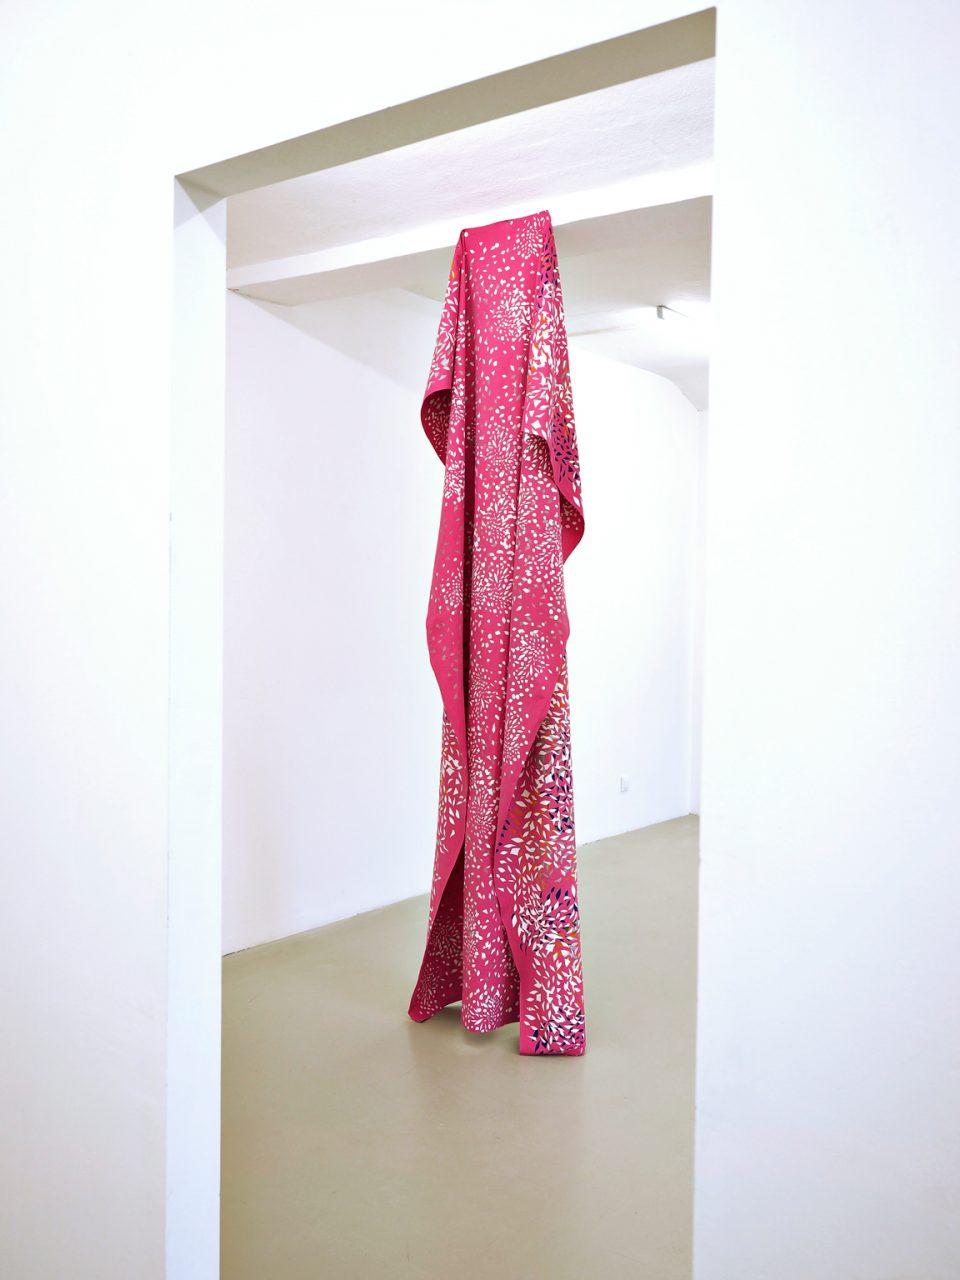 """Lost Places"", Bräuning contemporary, Hamburg, Germany (photo: Ralf Timm)"